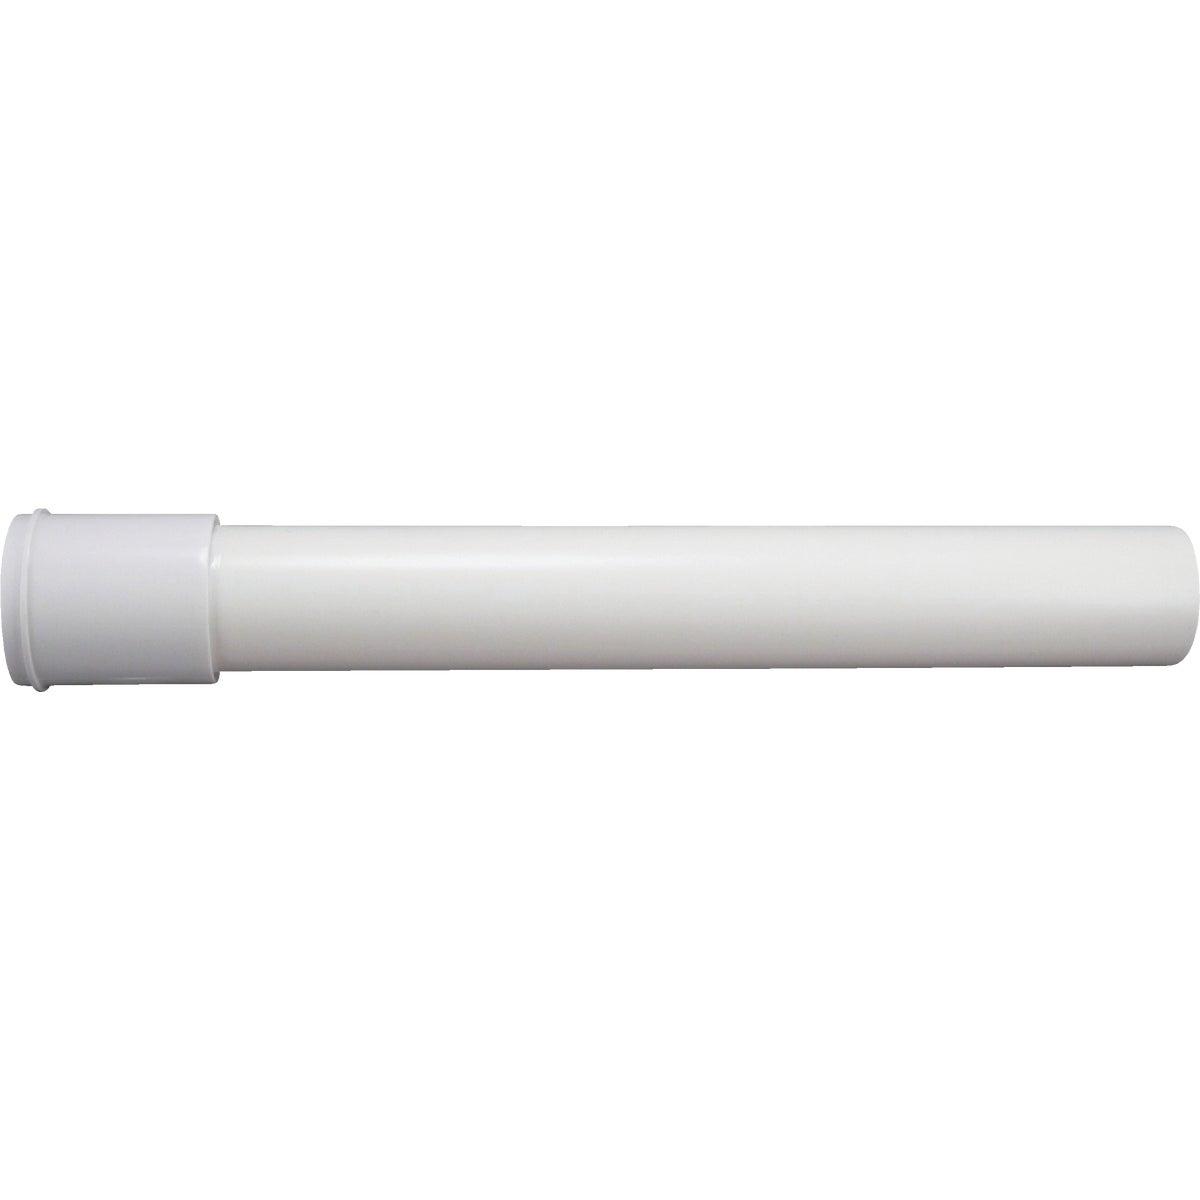 Plumb Pak/Keeney Mfg. 1-1/2X12 SOLV EXT TUBE 20-12WK